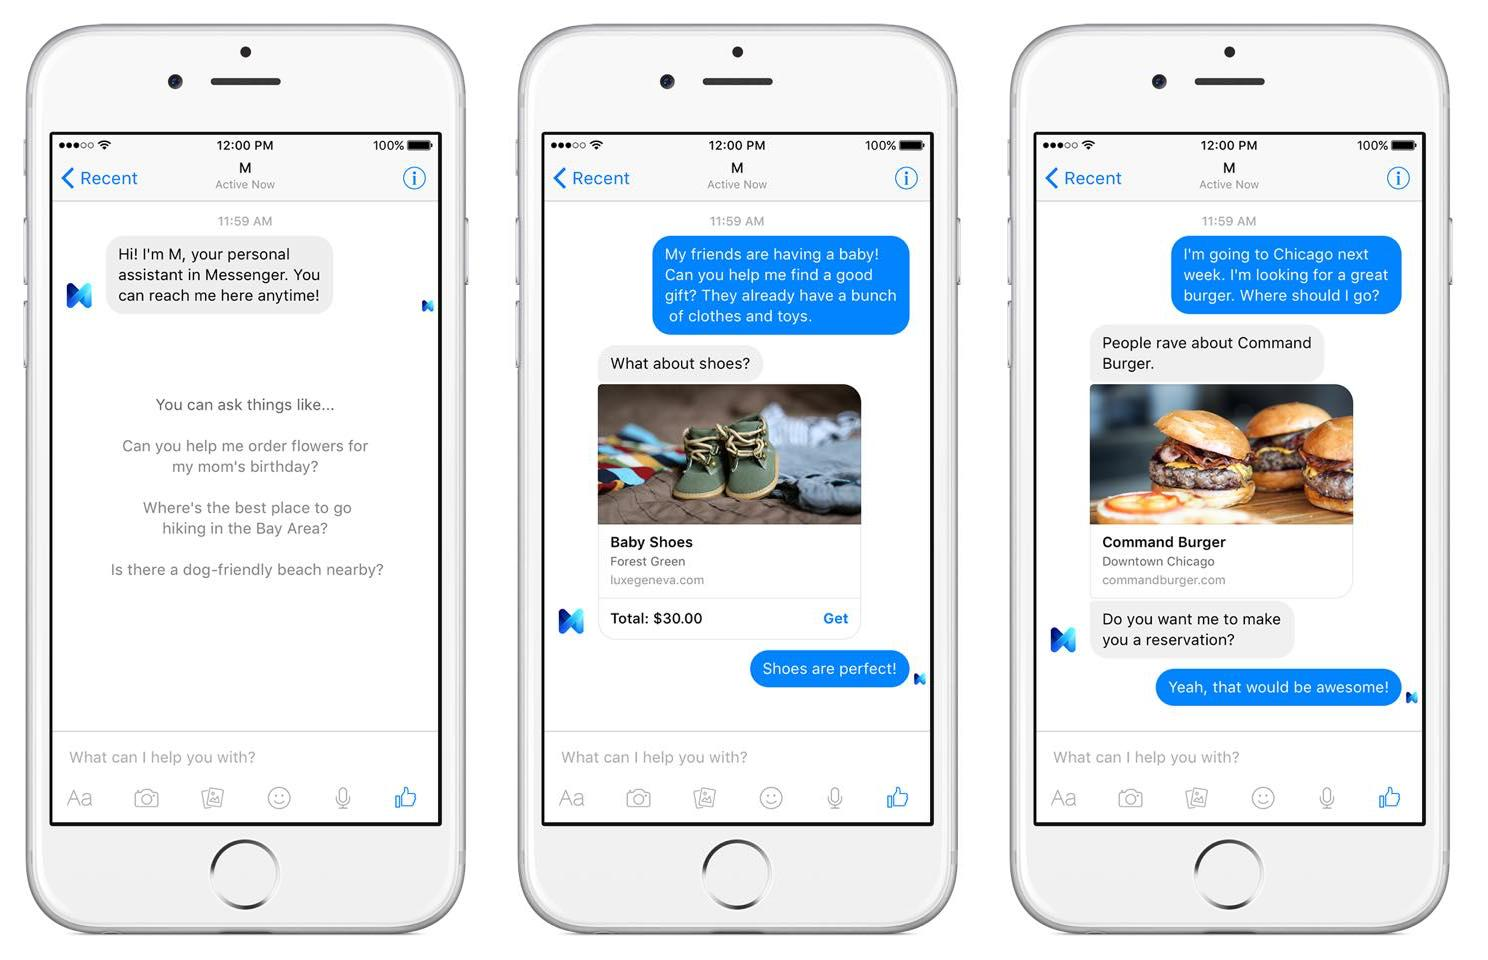 wersm-facebook-messenger-personal-assistant